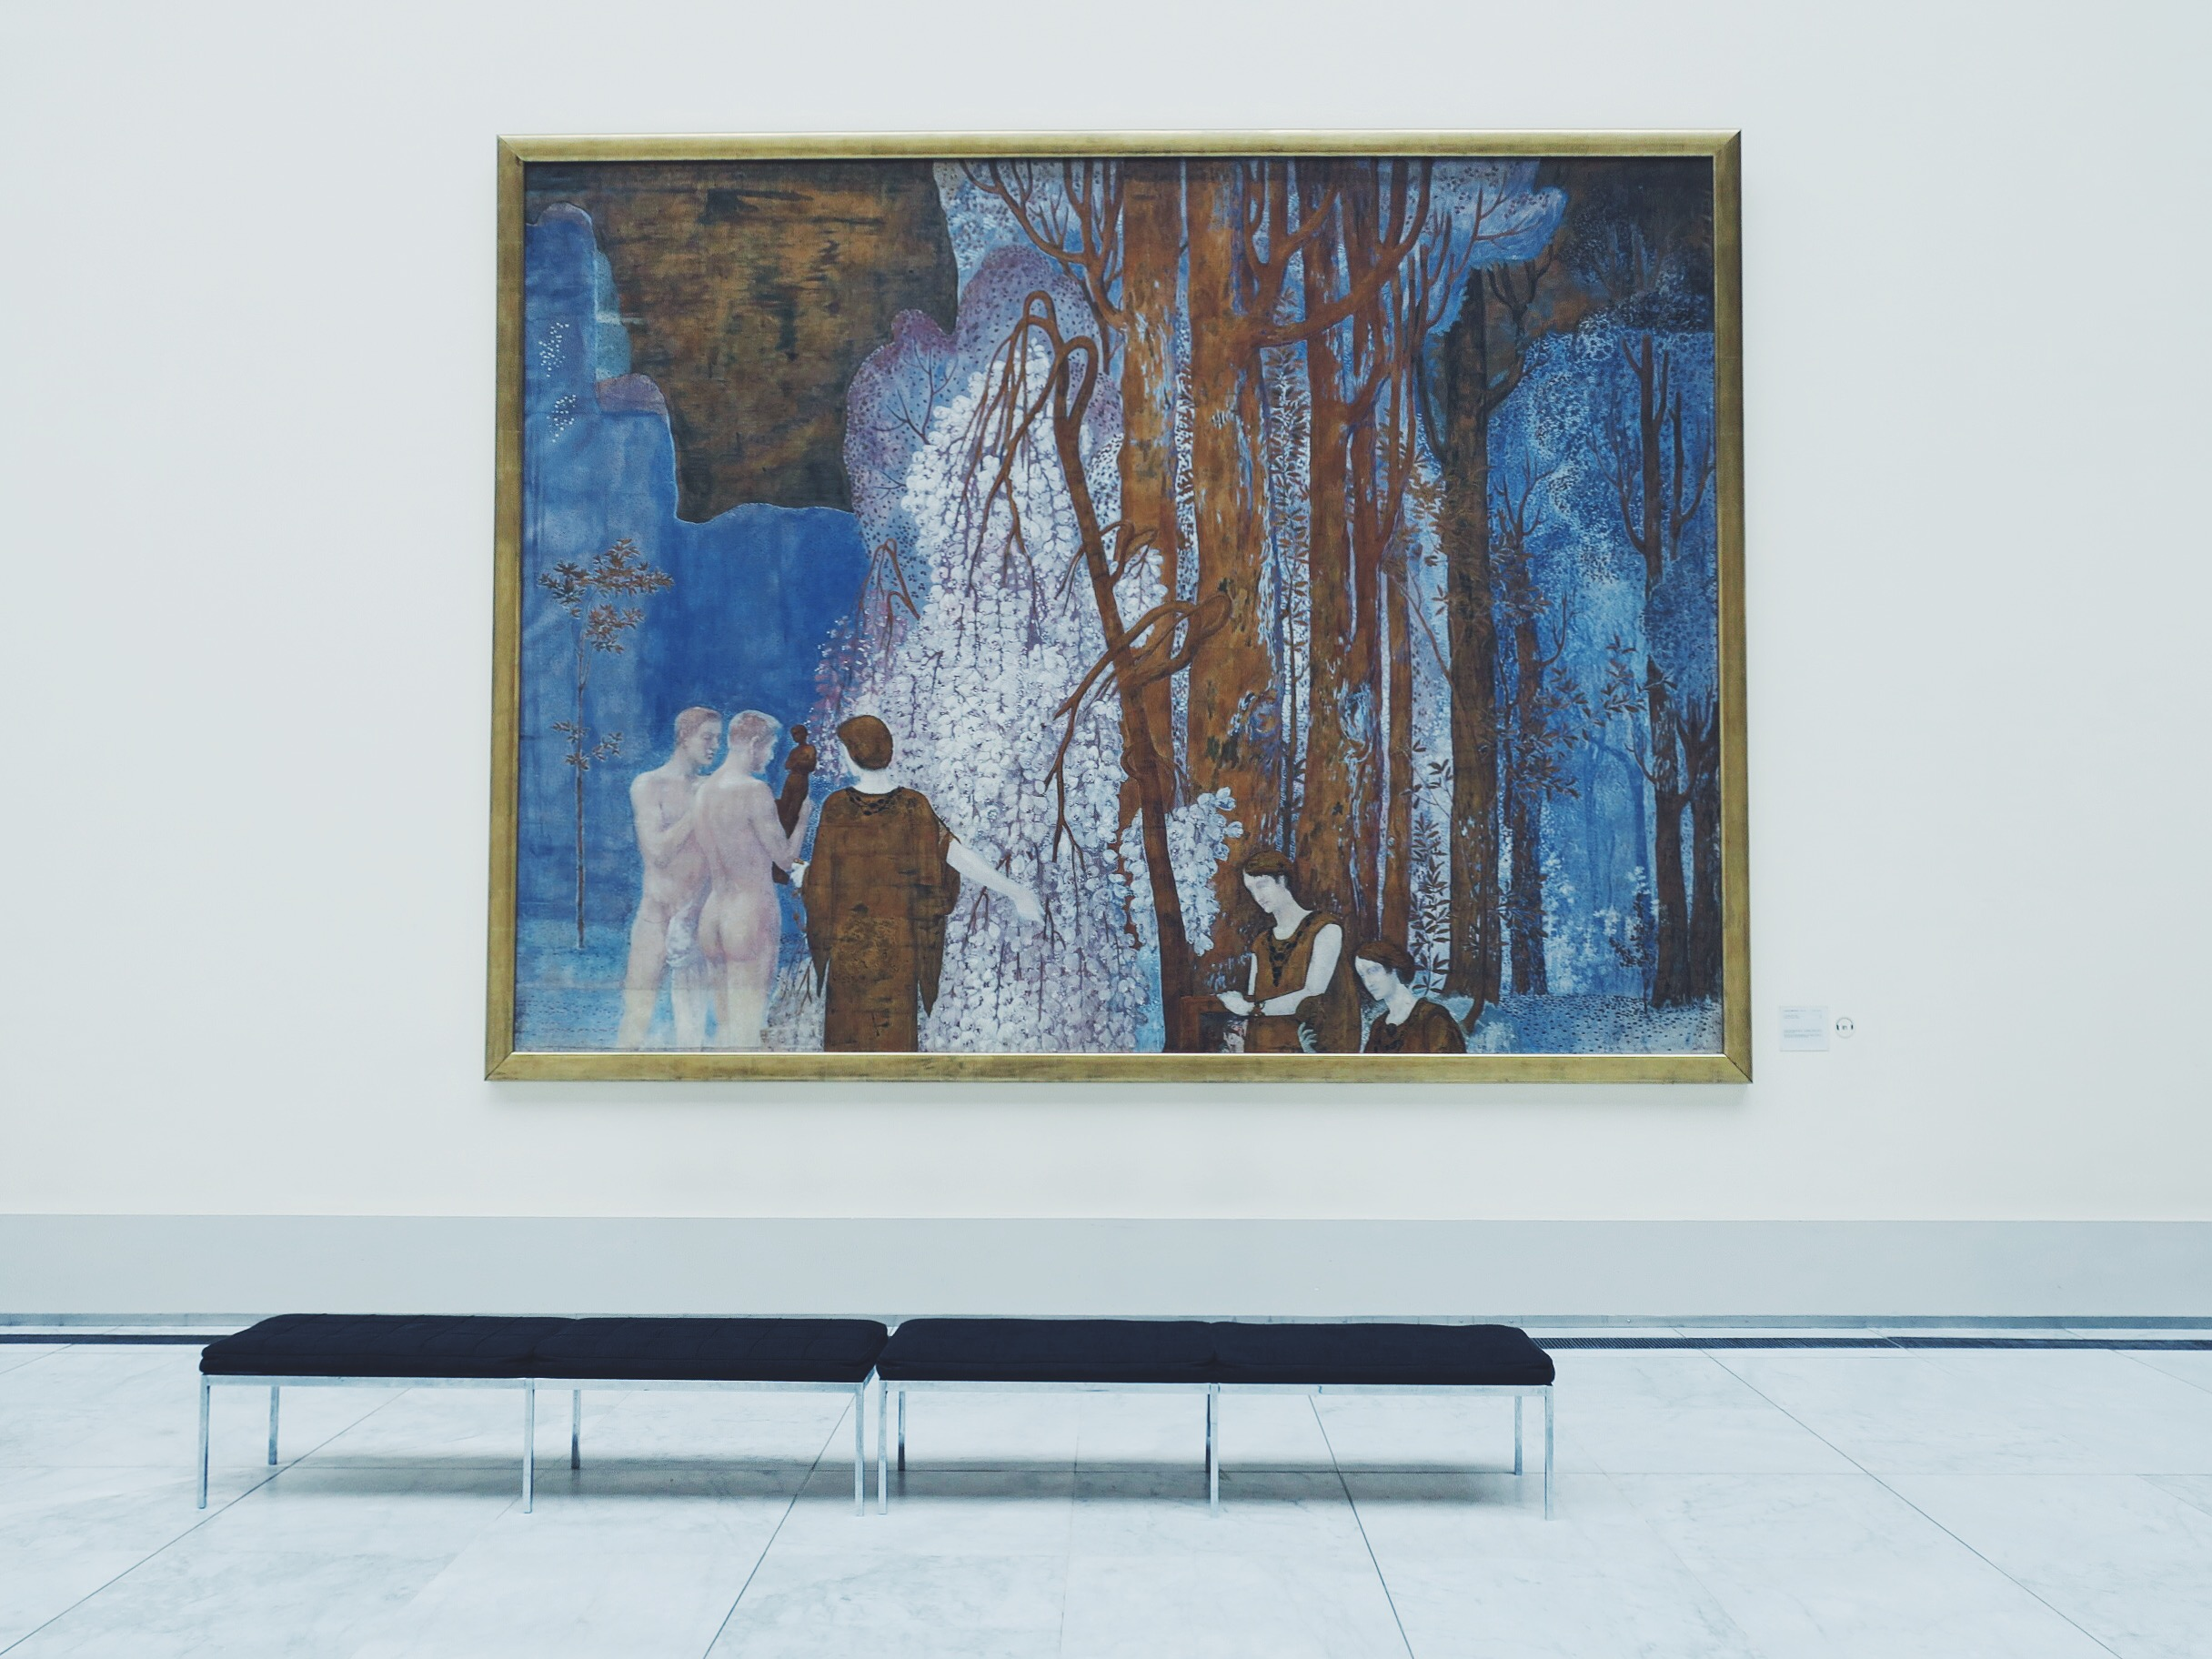 Main hall, Royal Museums of Fine Arts of Belgium